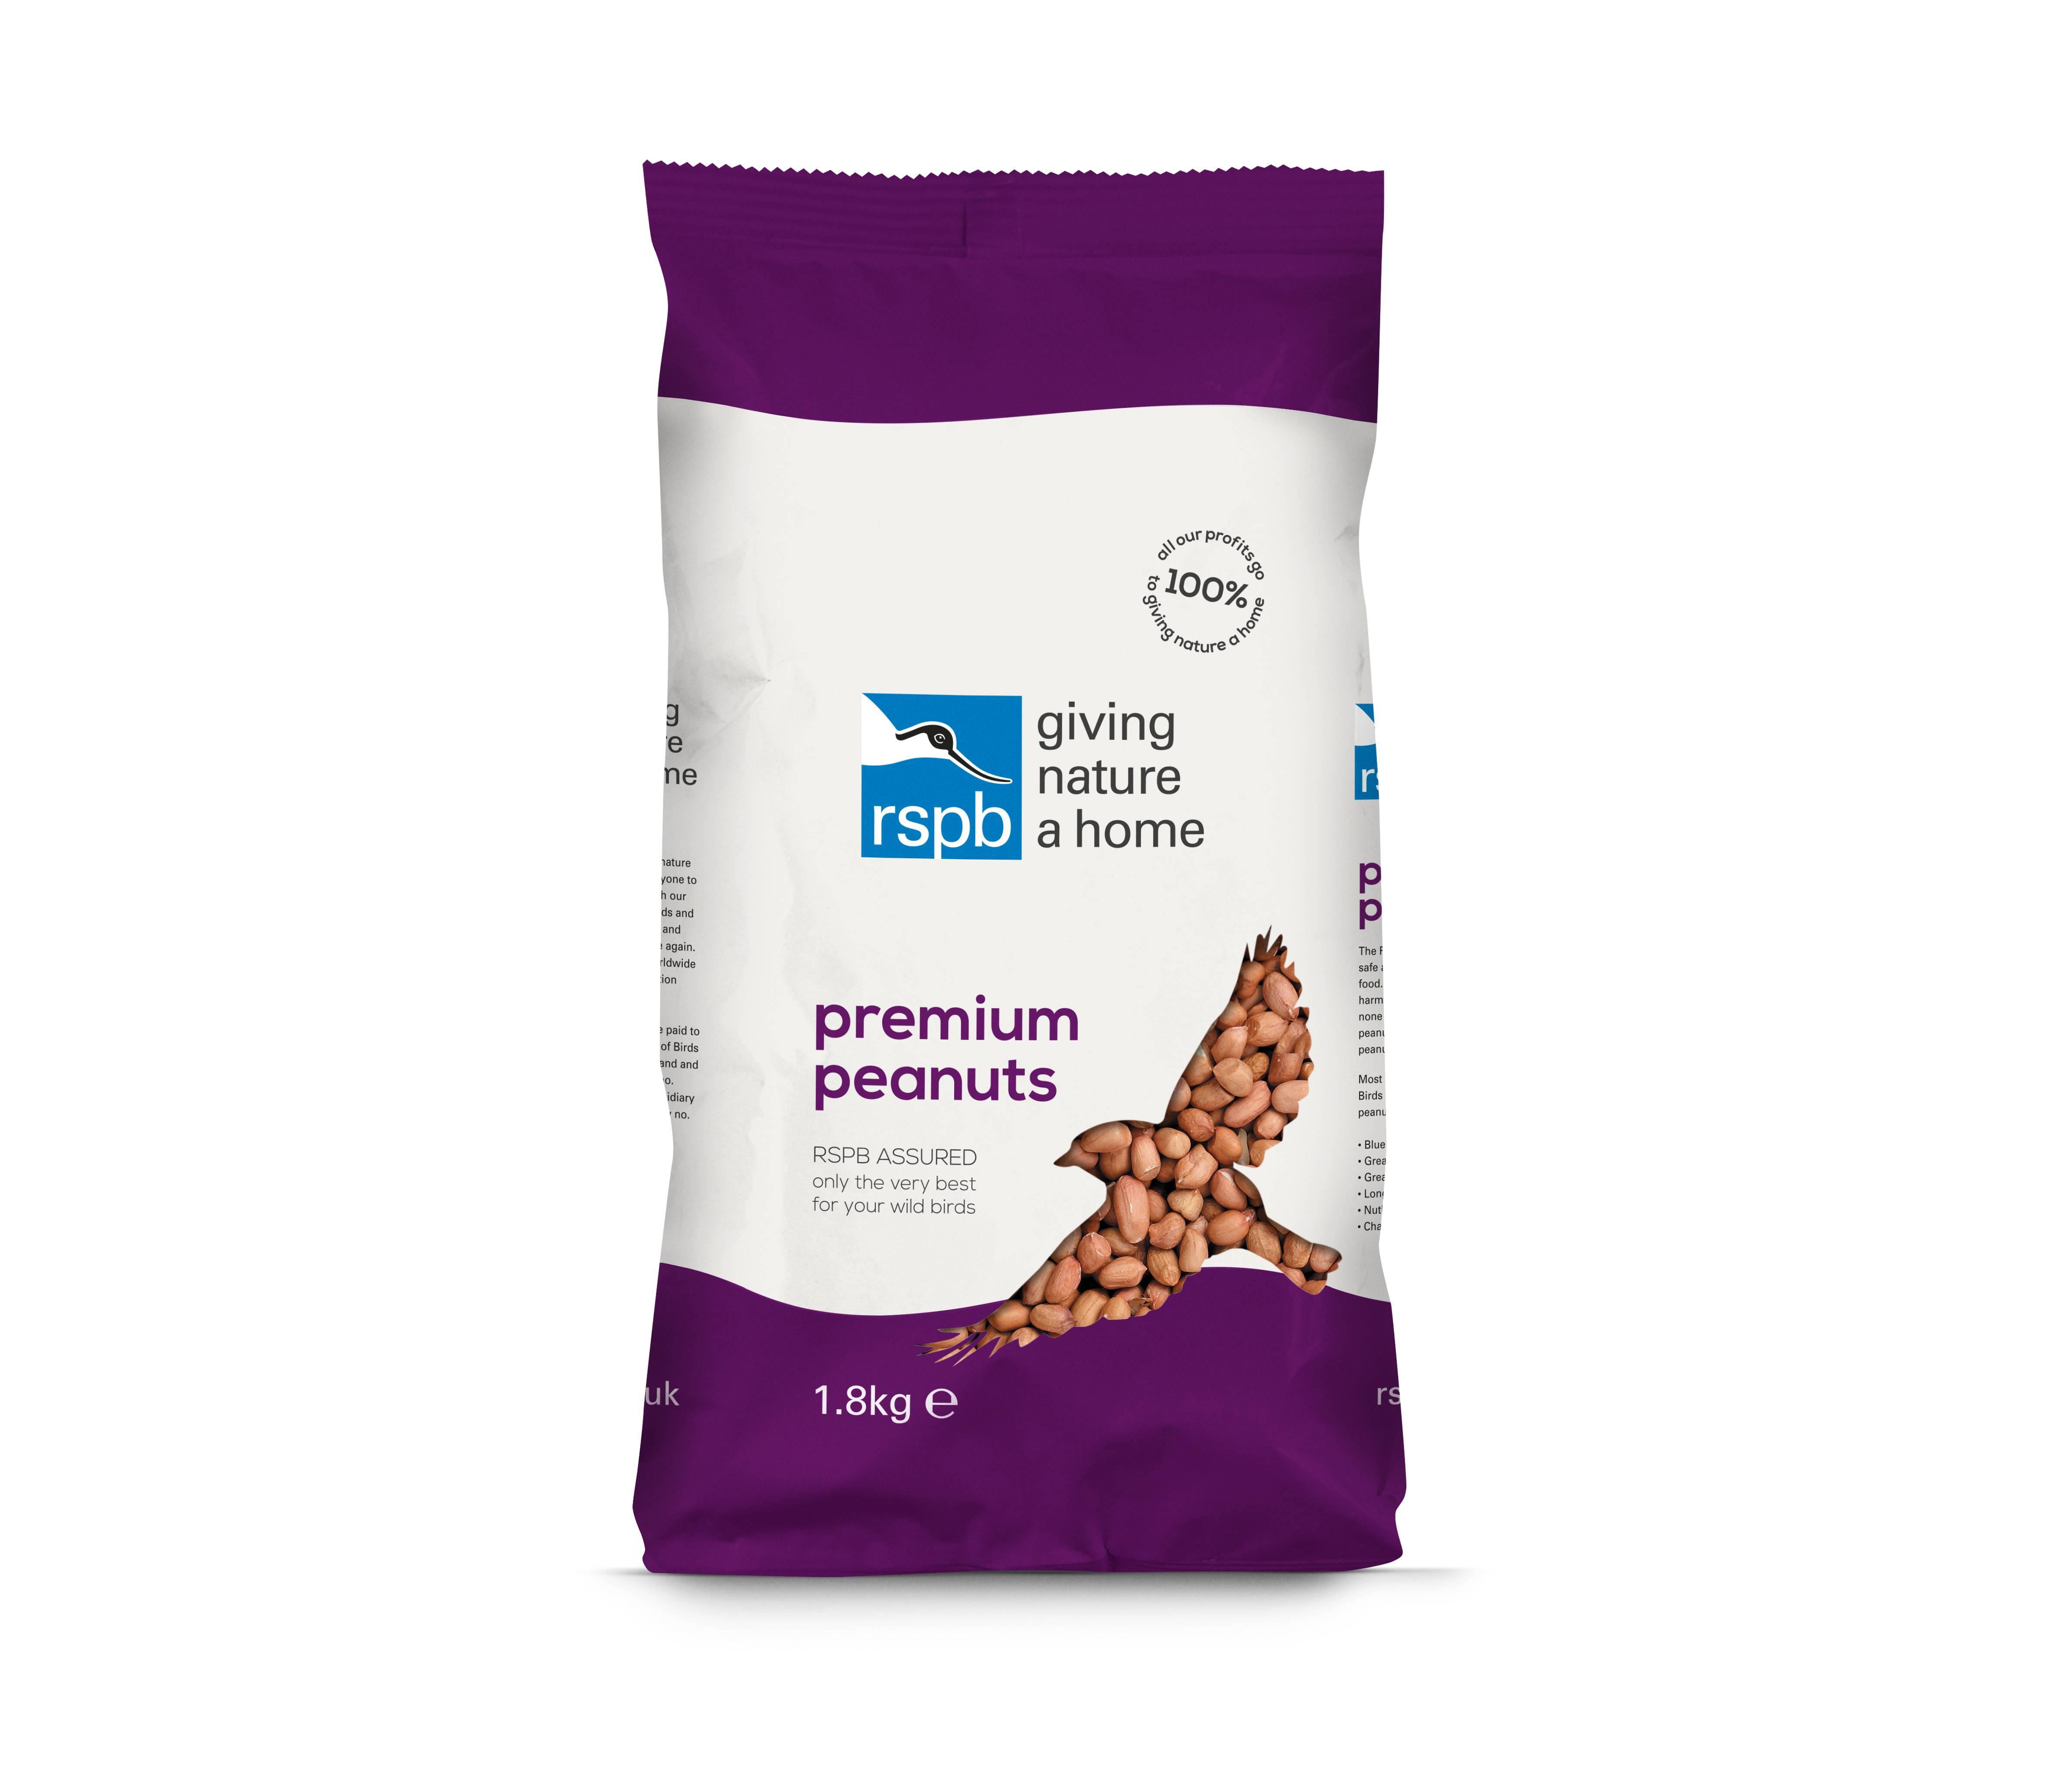 RSPB Premium Peanuts 1.8Kg